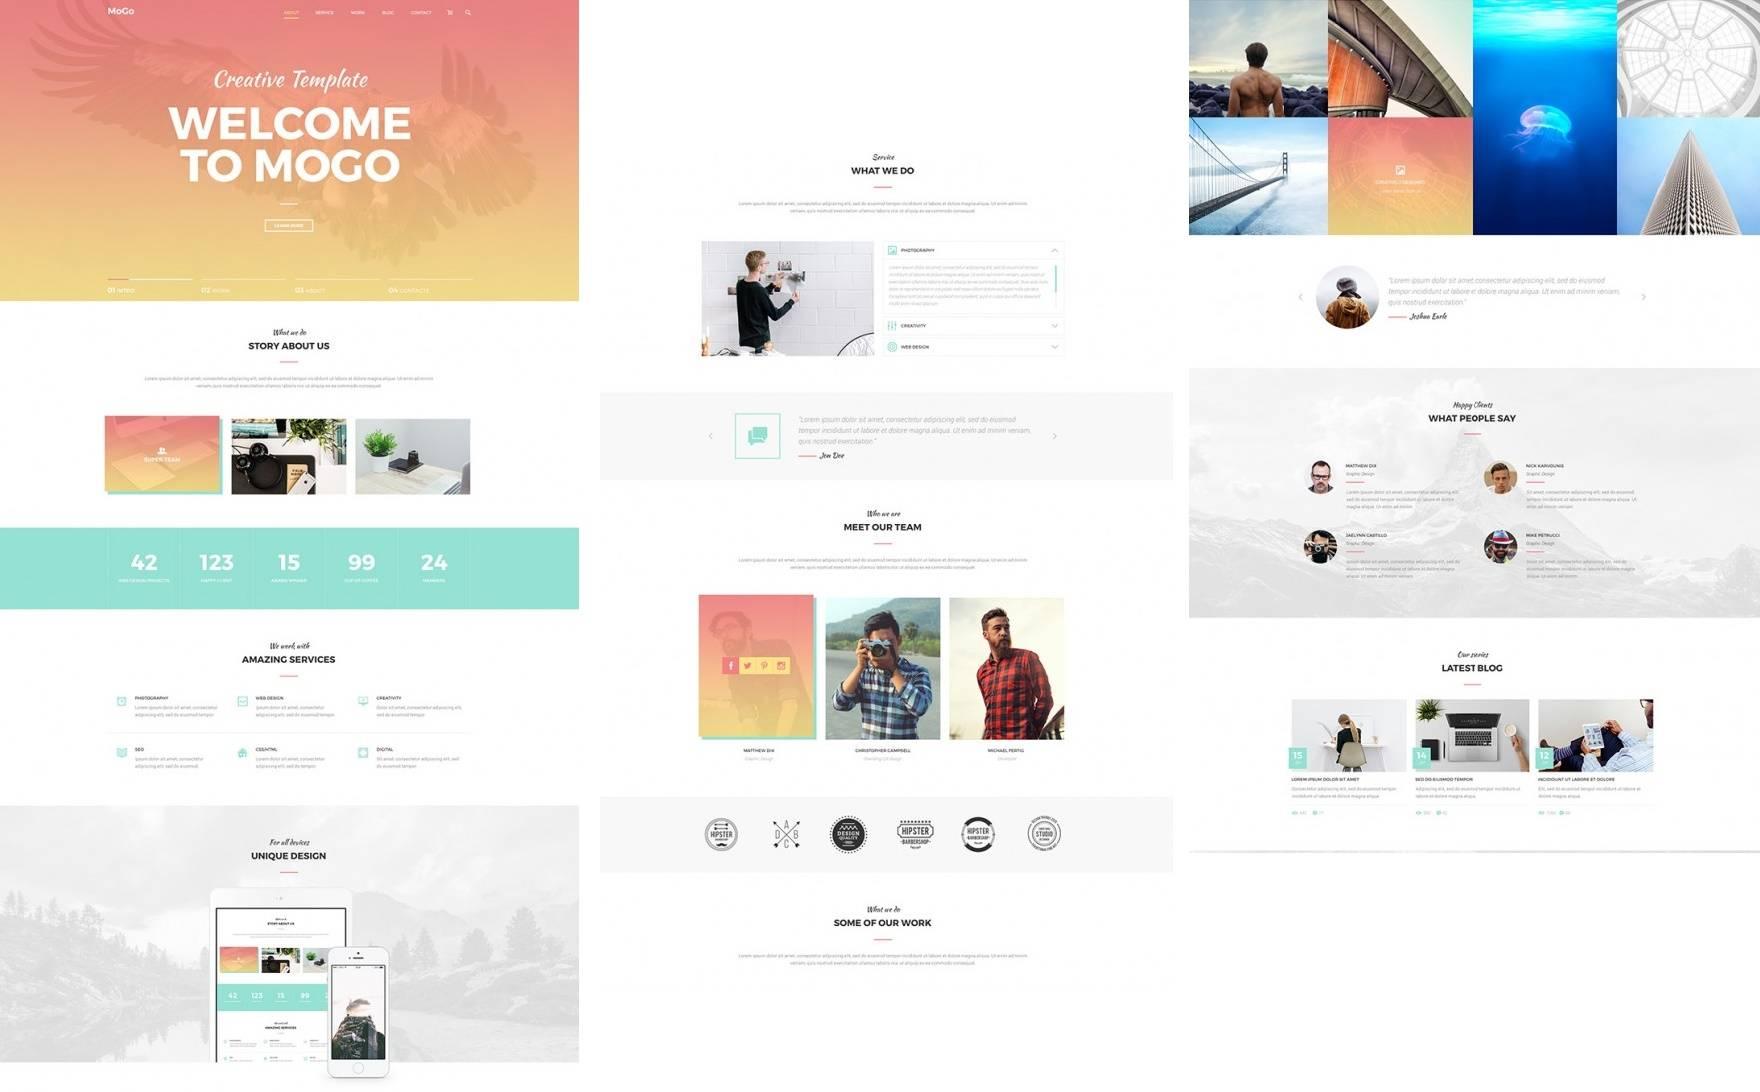 MoGo- free templates download for website